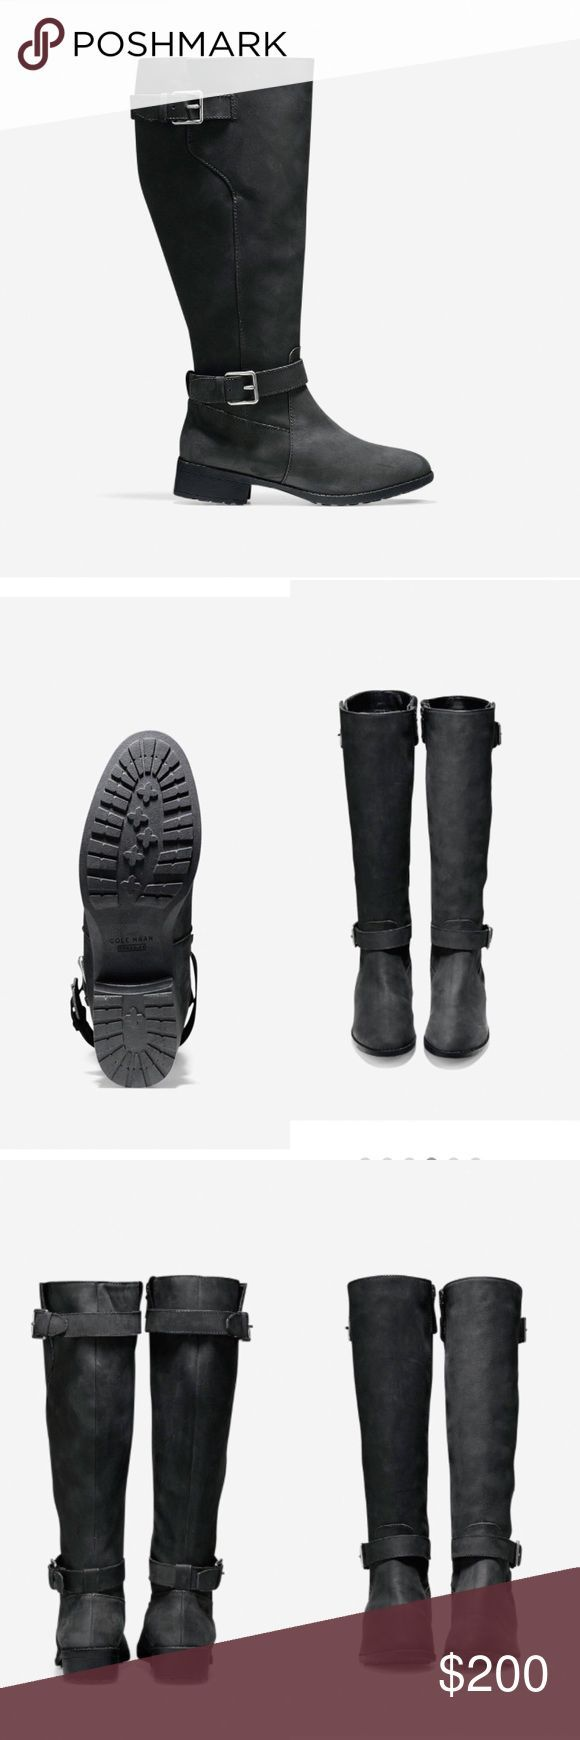 #Boot #Calf #Cole #Extended #Haan #Hastings #Ne #Rainy Day Outfit flannel #times #Waterproof #worn Cole Haan waterproof Hastings Boot - Extended Calf Only worn 2 times. In like ne...        Cole Haan防水ヘイスティングブーツ-拡張カーフ2回のみ着用。新品同様。拡張されたふくらはぎを備えたヘイスティングス防水ブーツは、防水レザーで構築され、バックルの二重層を誇っています。フランネルの裏地が付いたヘイスティングスは、ウェリーの完璧な雨の日の代わりになります。フランネルが並んでいます。完全にパッド... #rainydayoutfitforwork